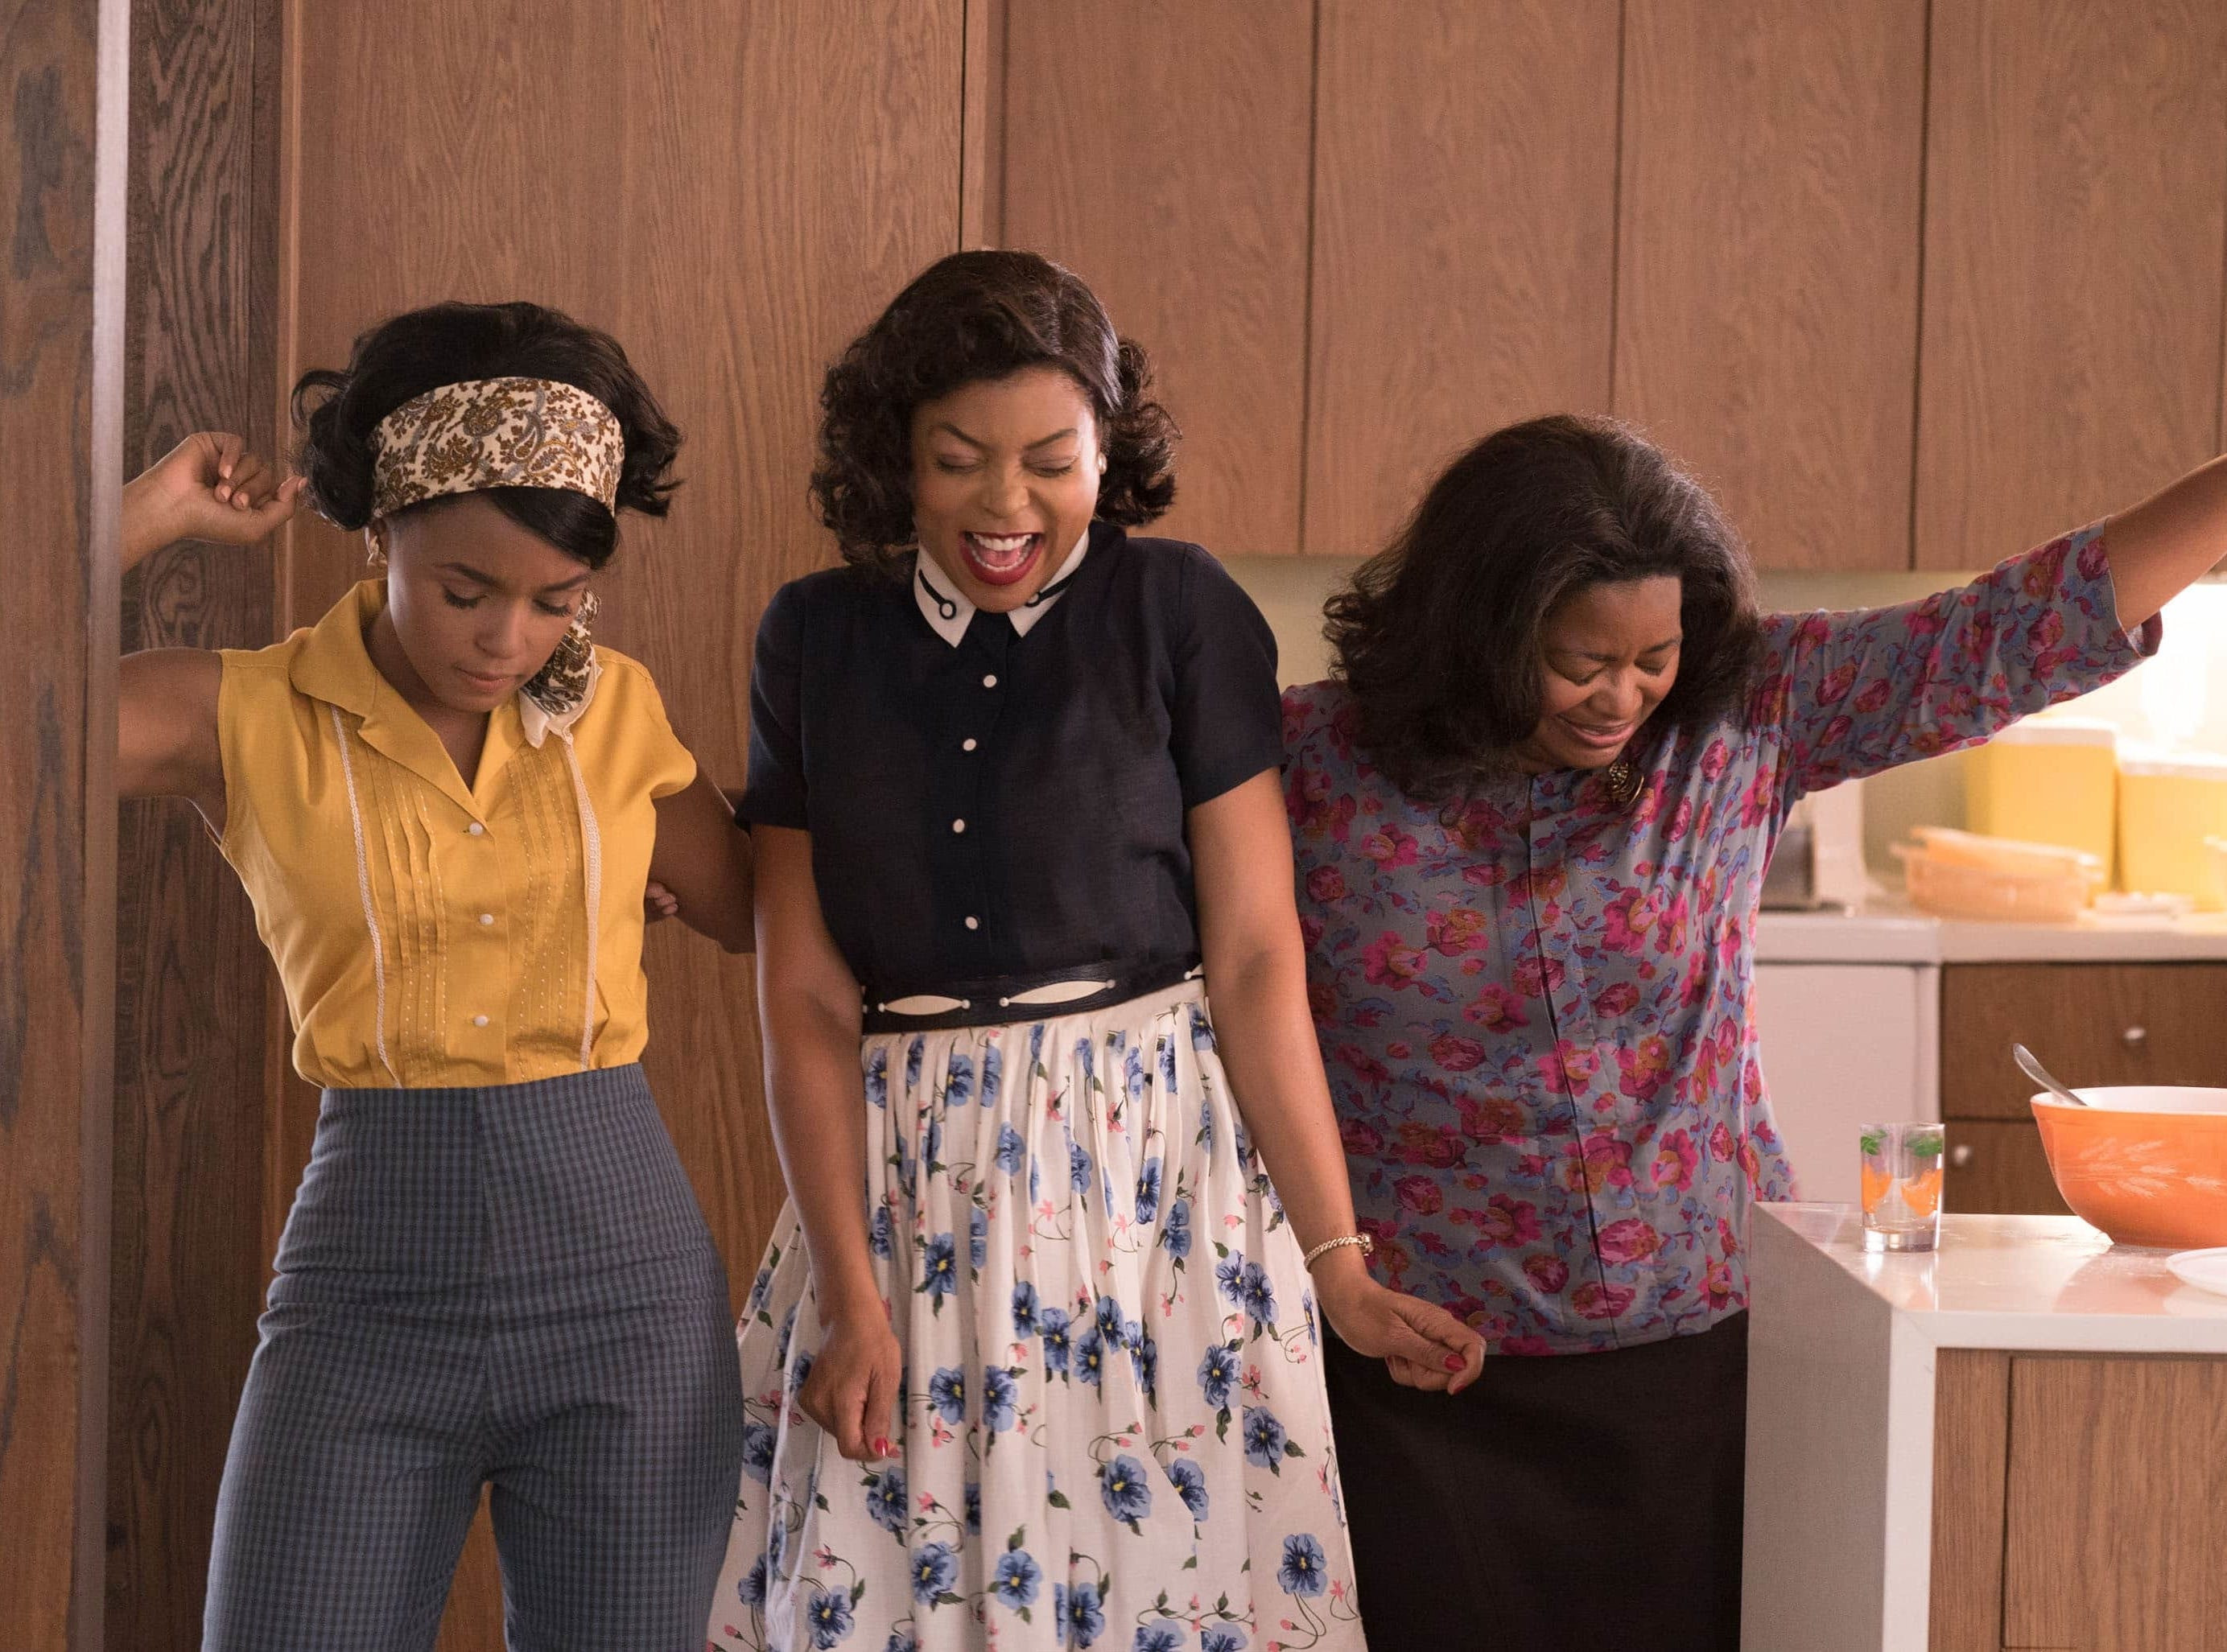 Mary Jackson (Janelle Monae, left), Katherine Johnson (Taraji P. Henson) and Dorothy Vaughan (Octavia Spencer) take time to dance in the period drama 'Hidden Figures.'